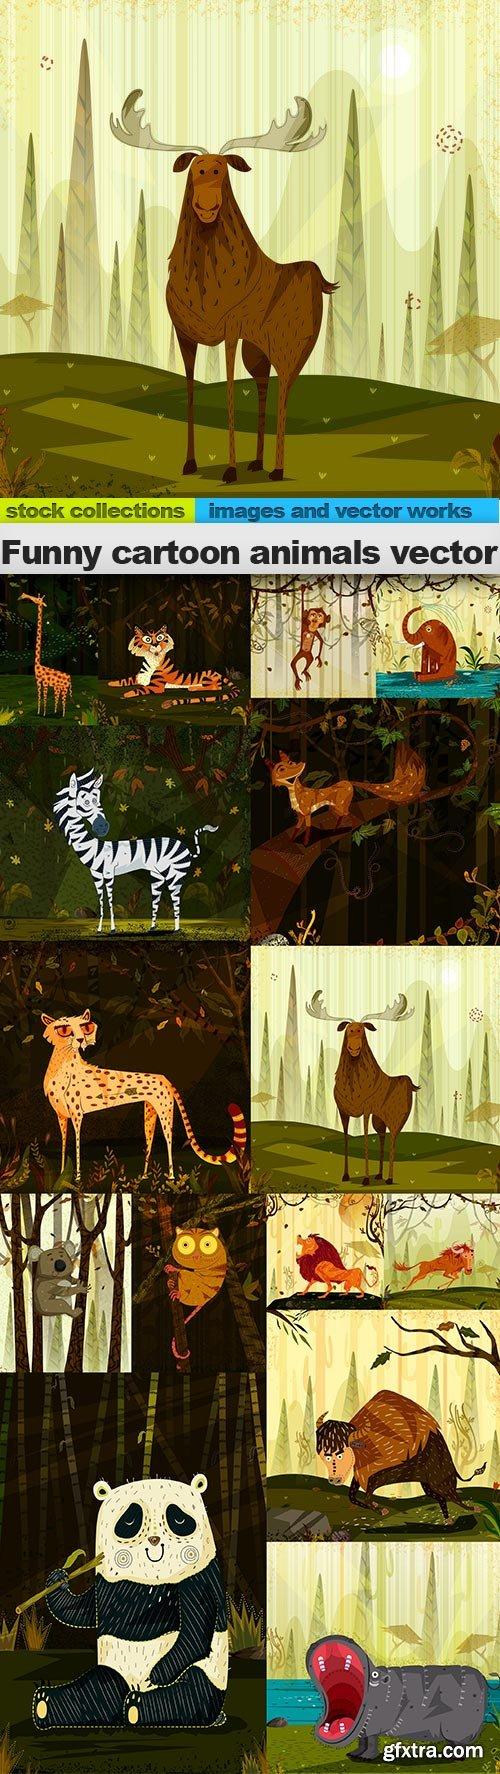 Funny cartoon animals vector, 15 x EPS